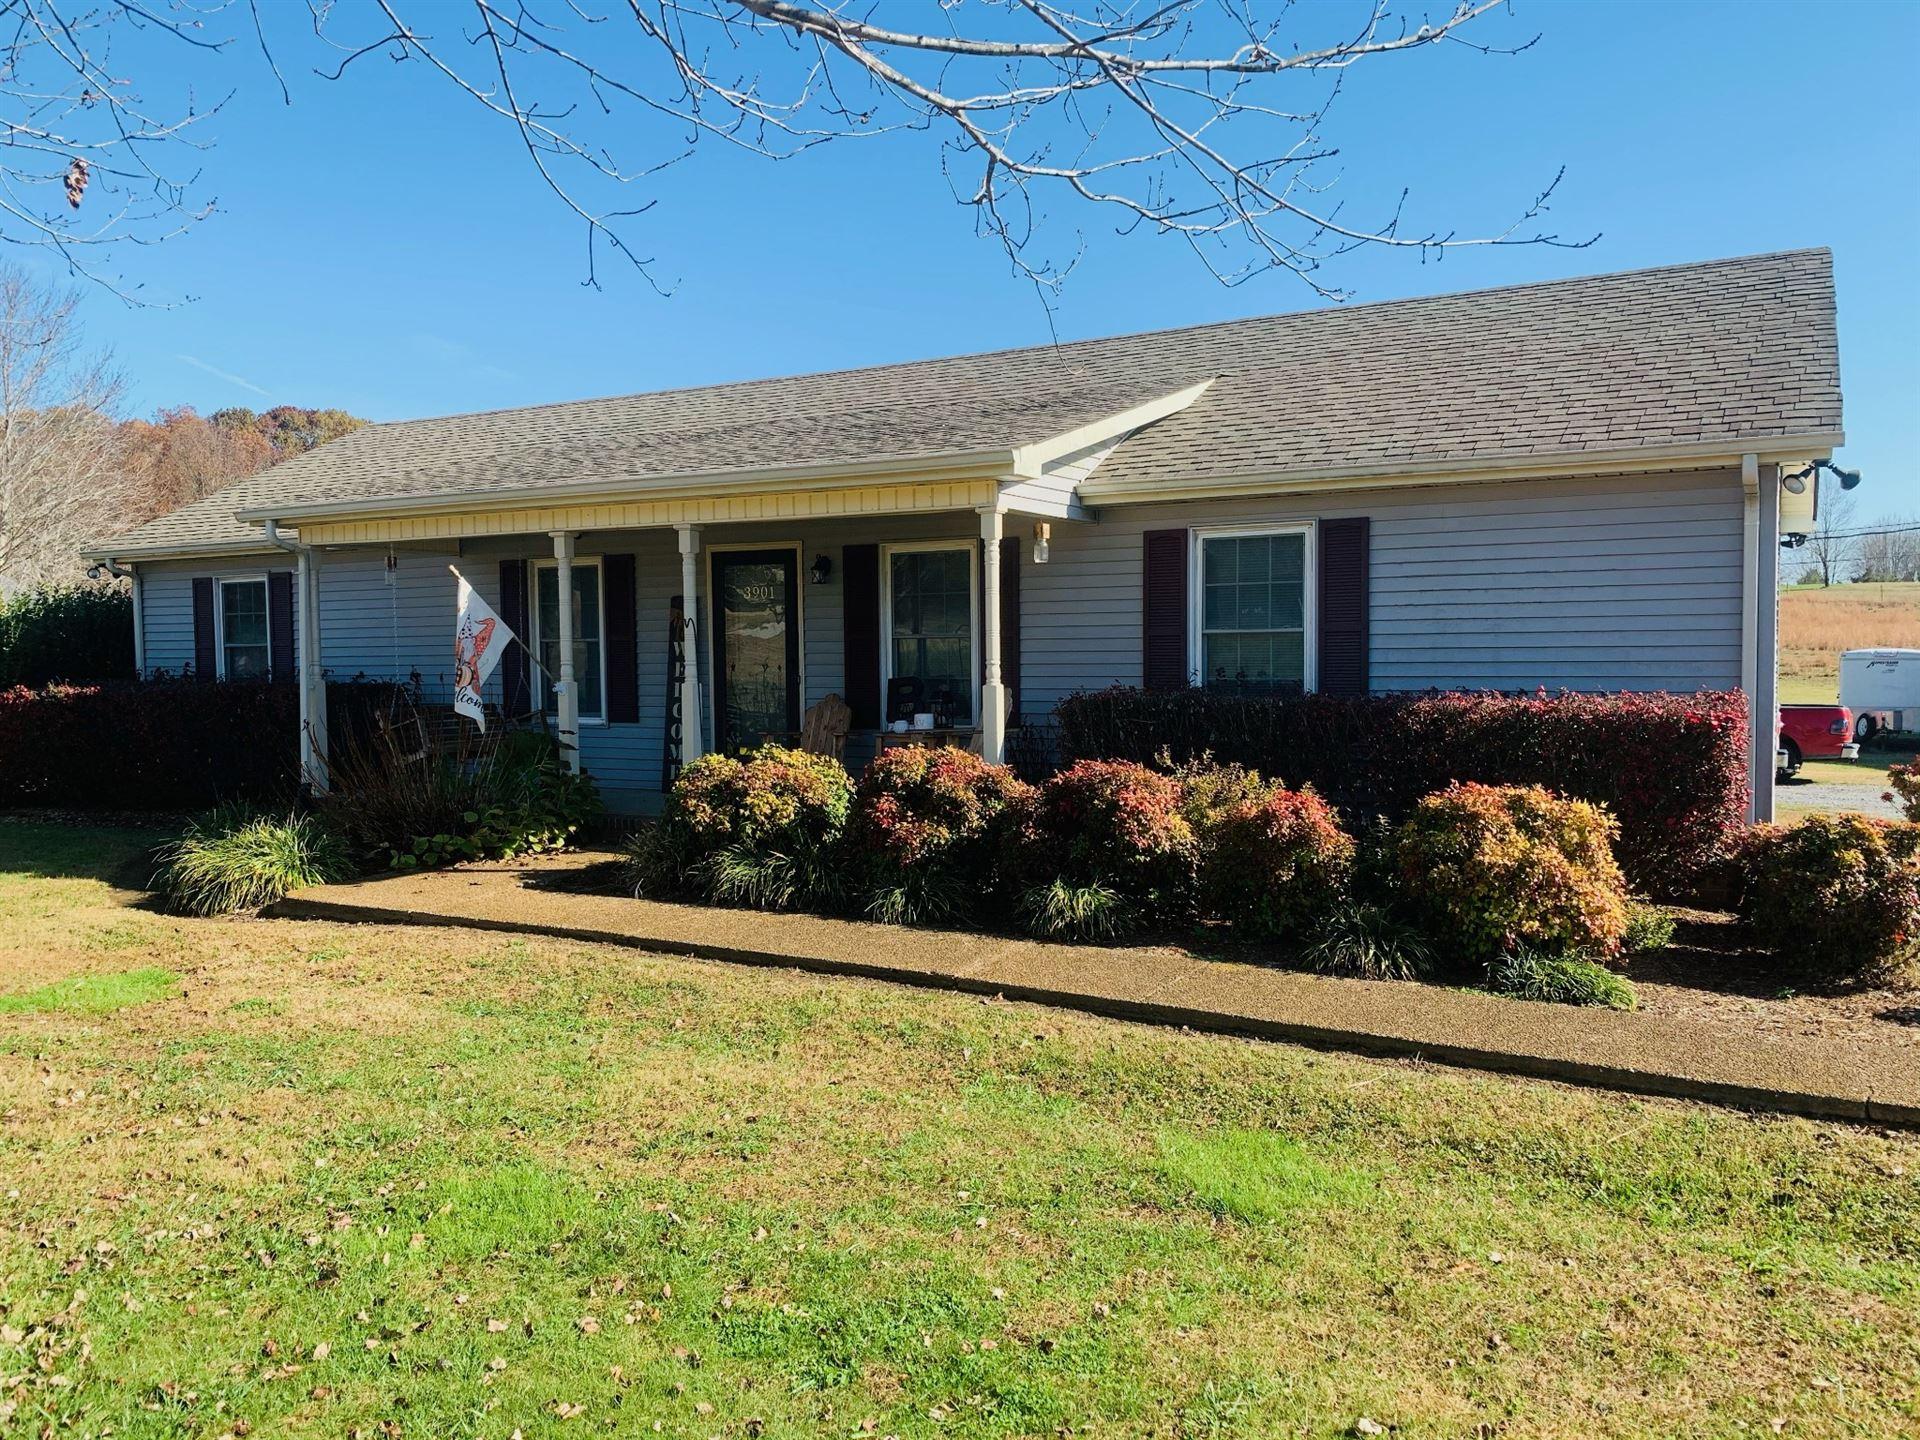 3901 Armstrong Rd, Springfield, TN 37172 - MLS#: 2200601